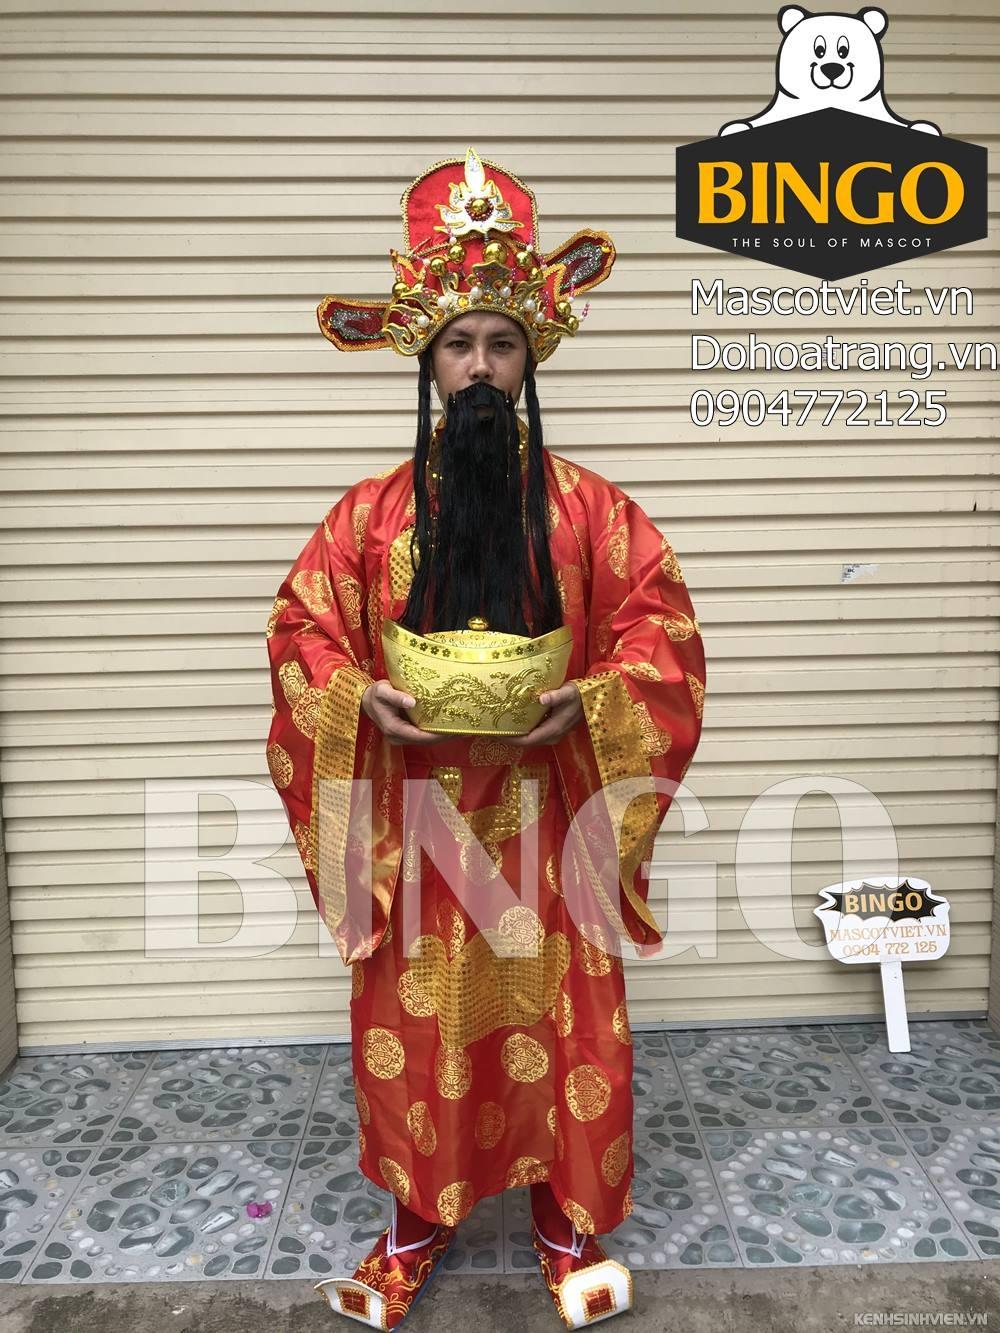 trang-phuc-hoa-trang-than-tai-bingo-costumes-0904772125.jpg